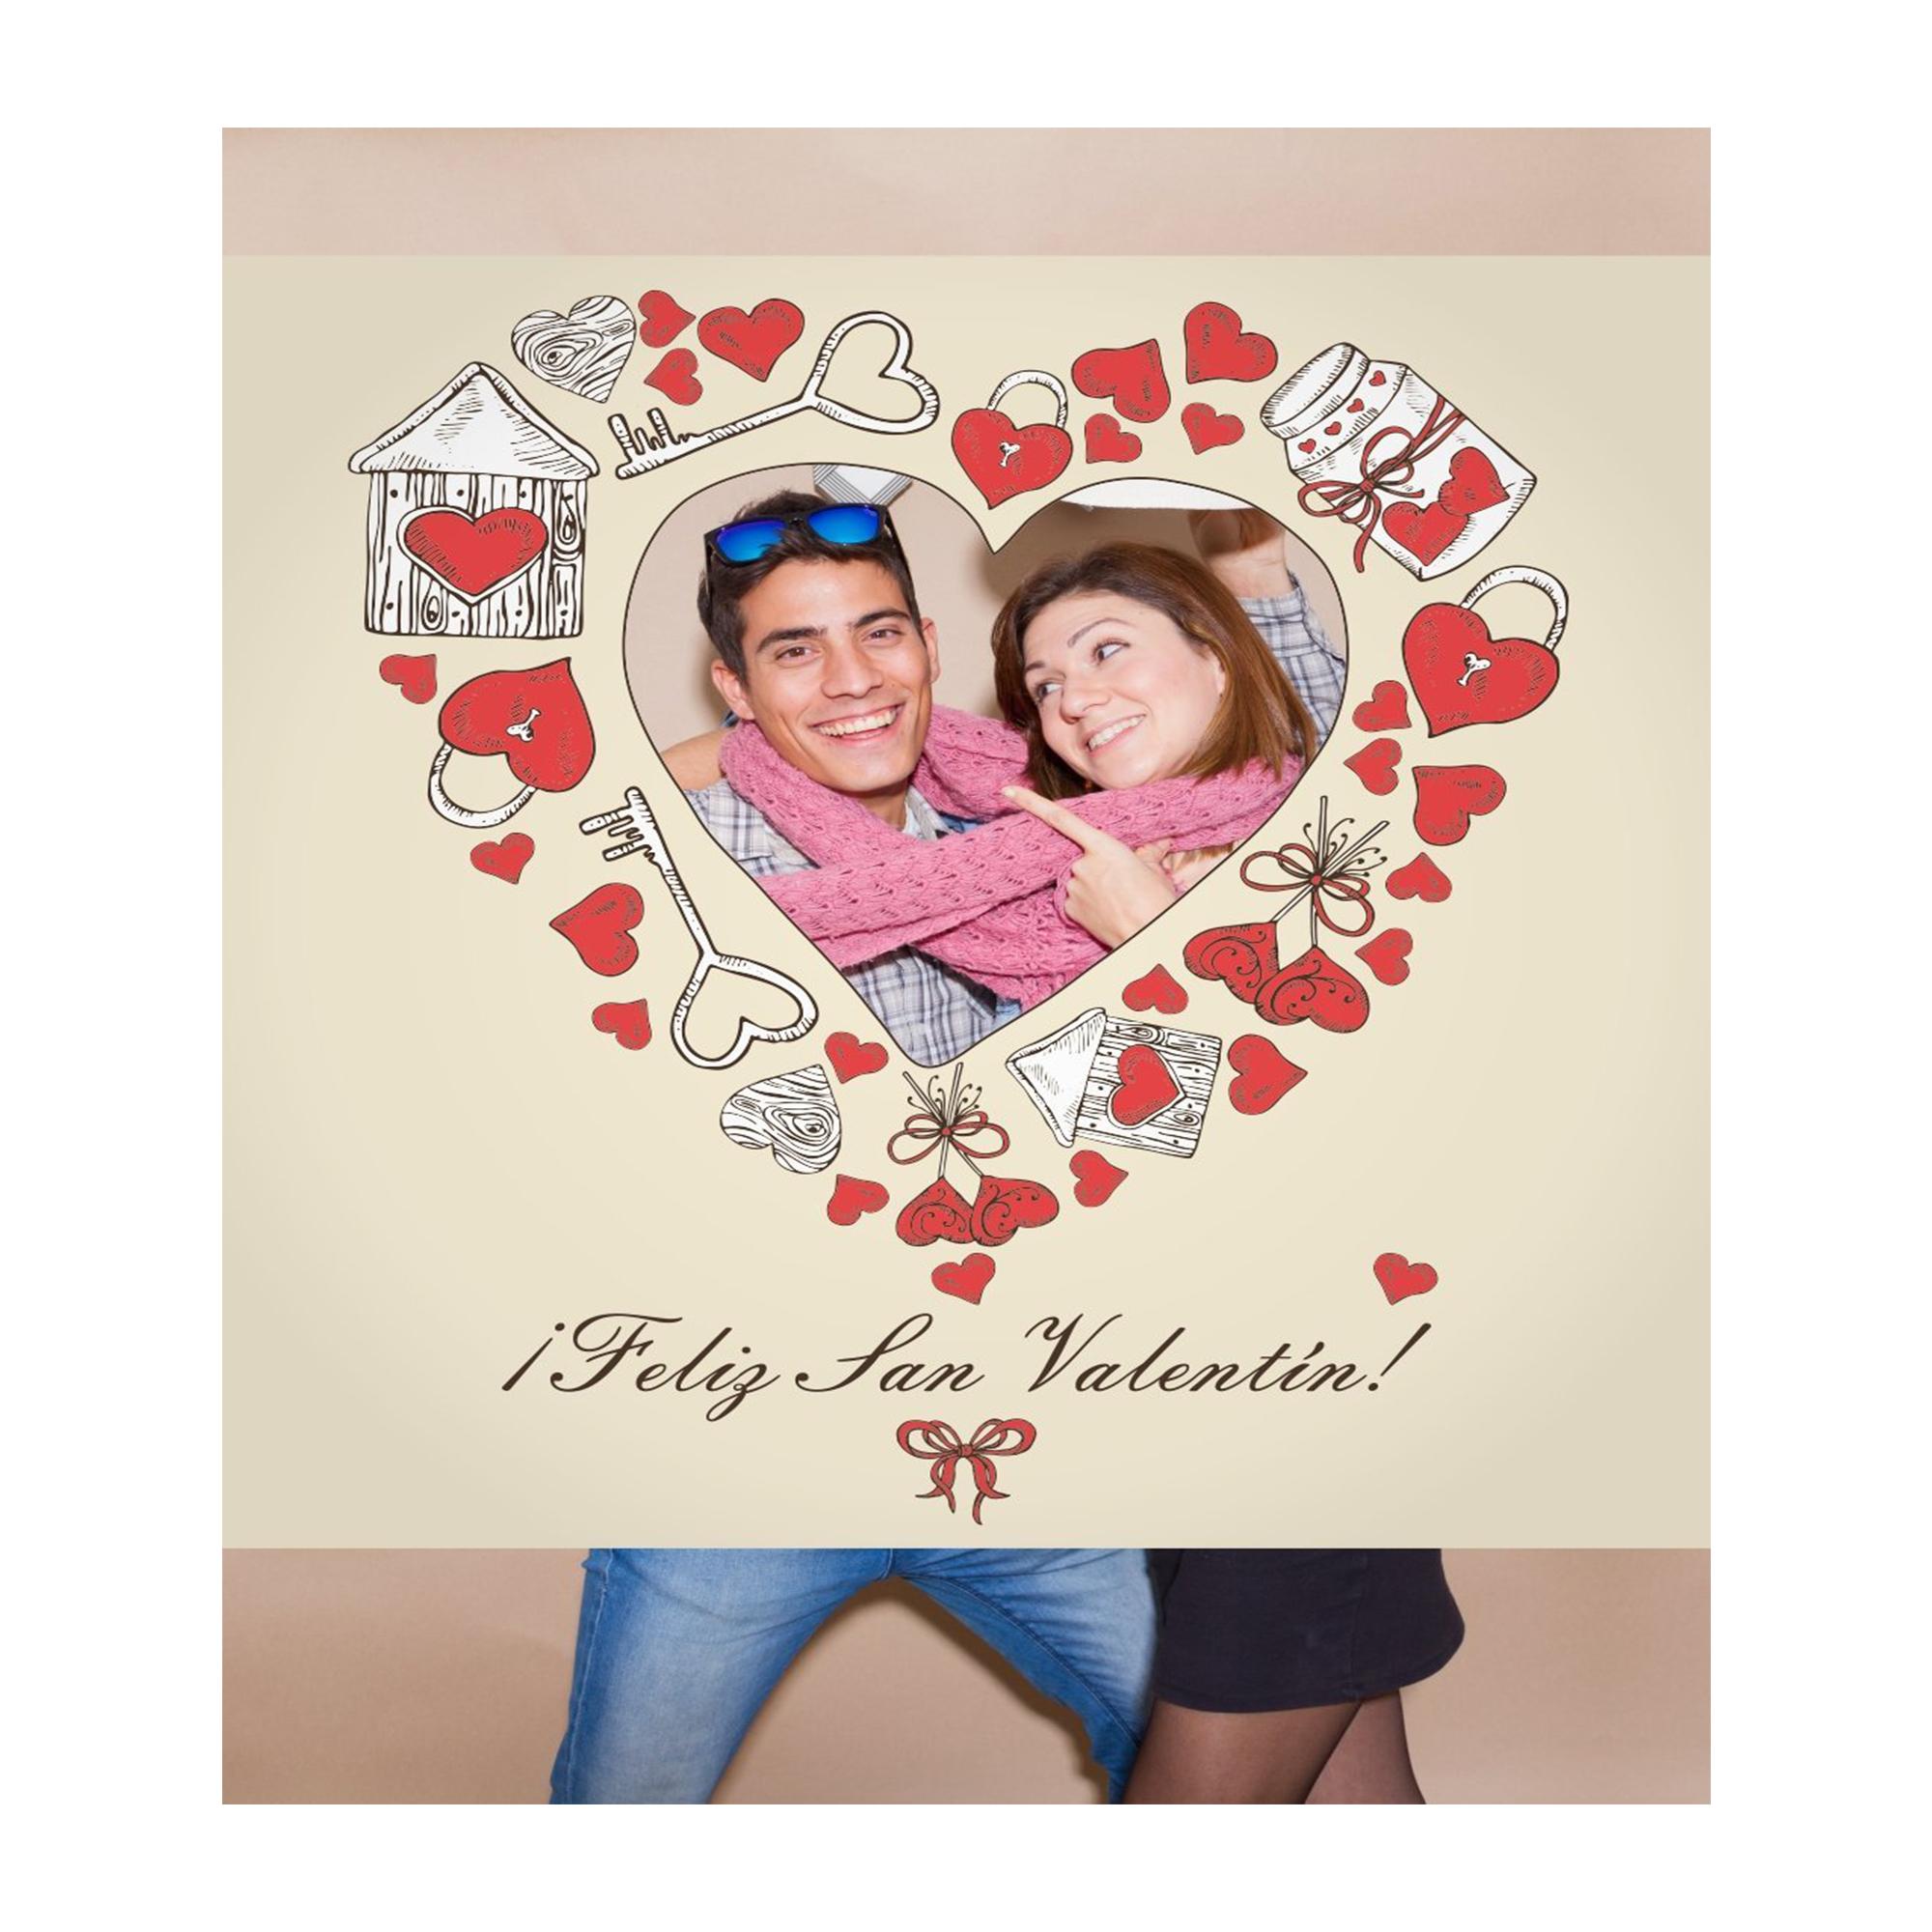 Photocall San Valentin 1x1m